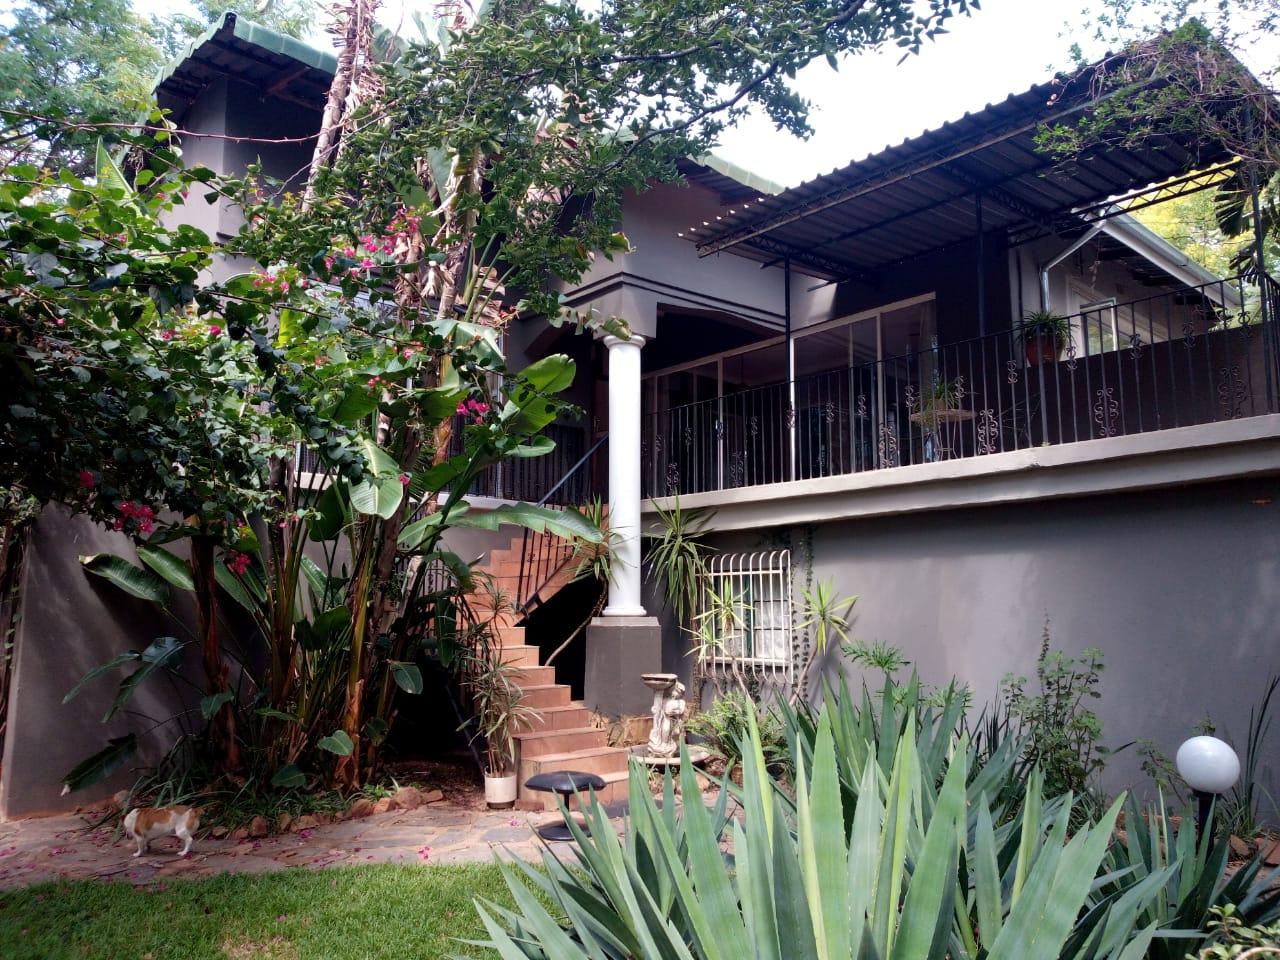 Kameeldrift East - House to rent on smallholding